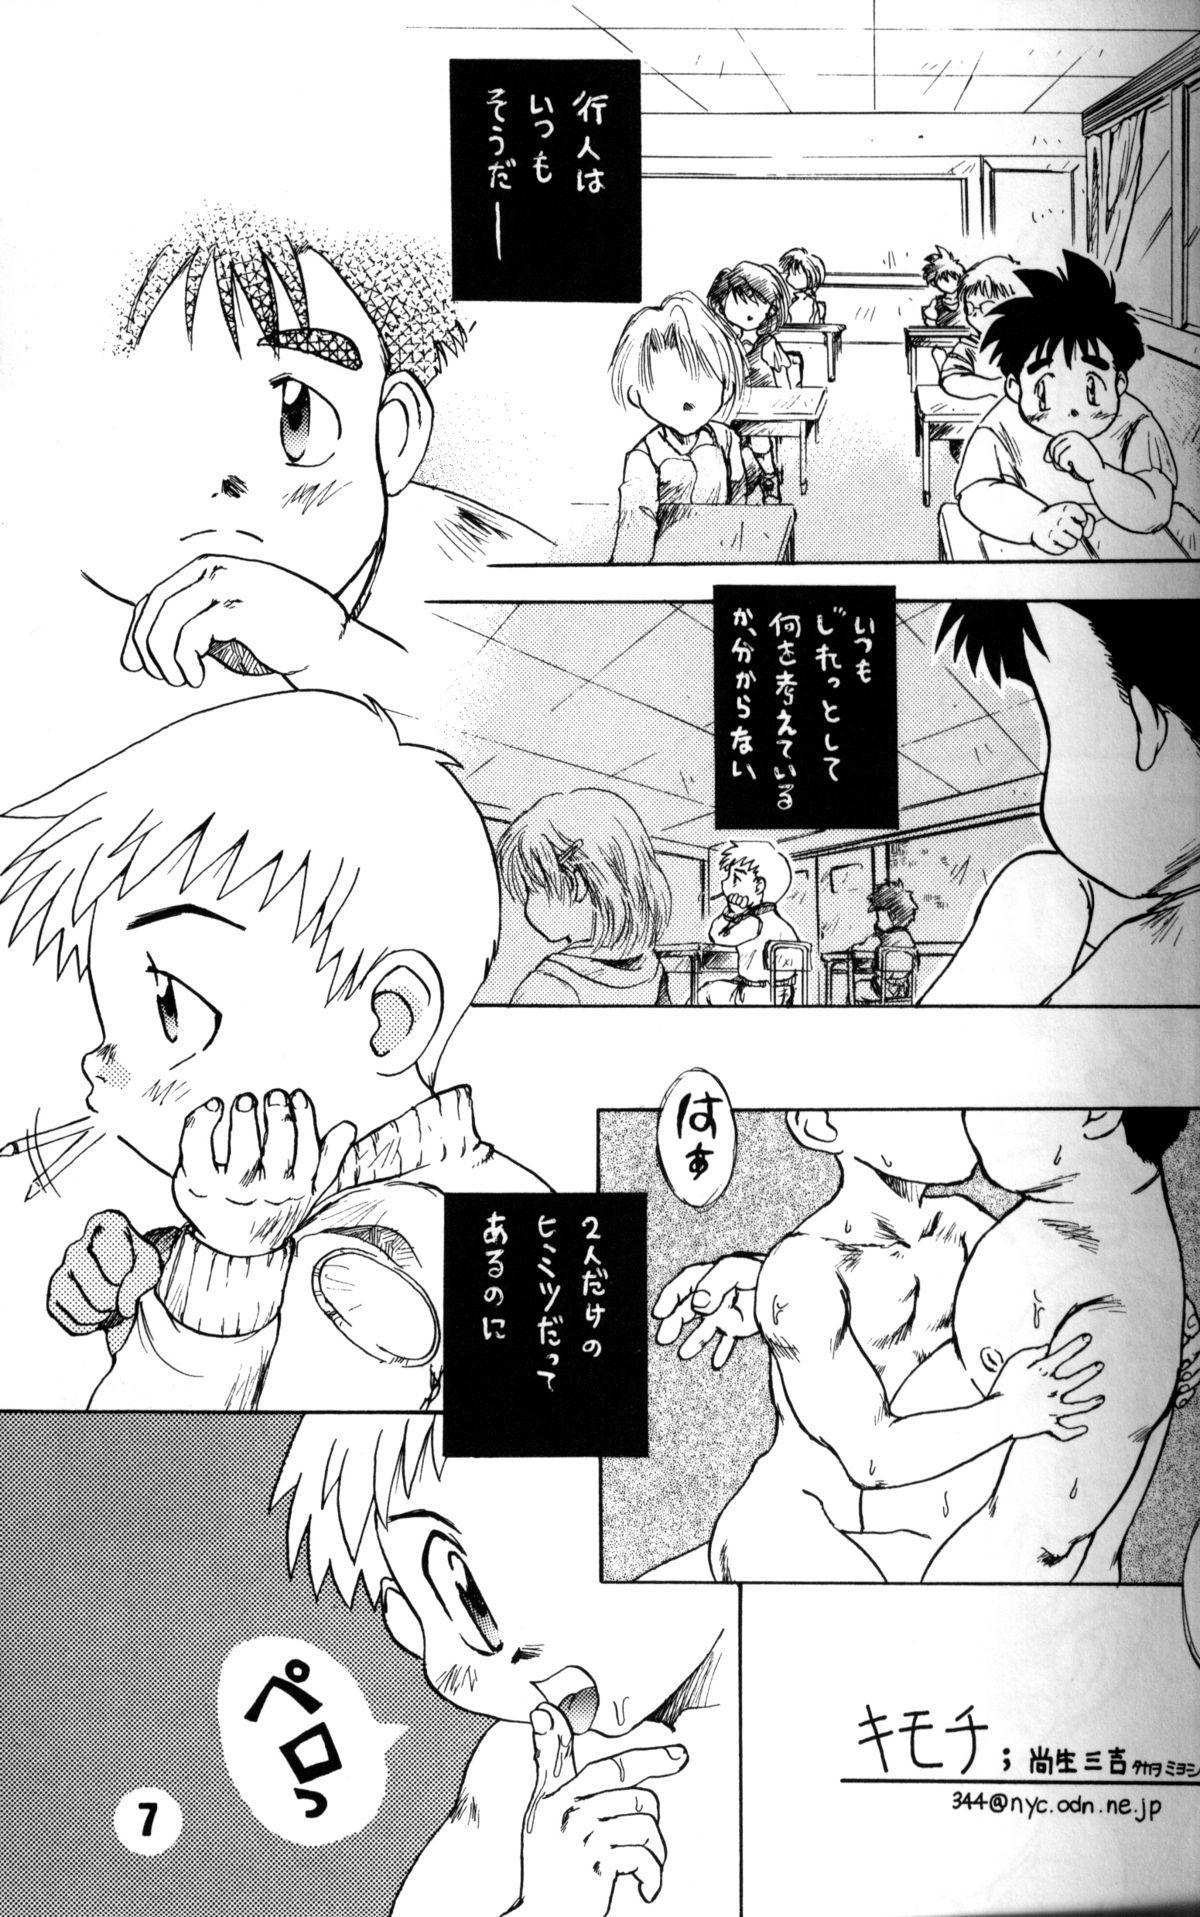 Anthology - Nekketsu Project - Volume 4 'Shounen Vanilla Essence' 5